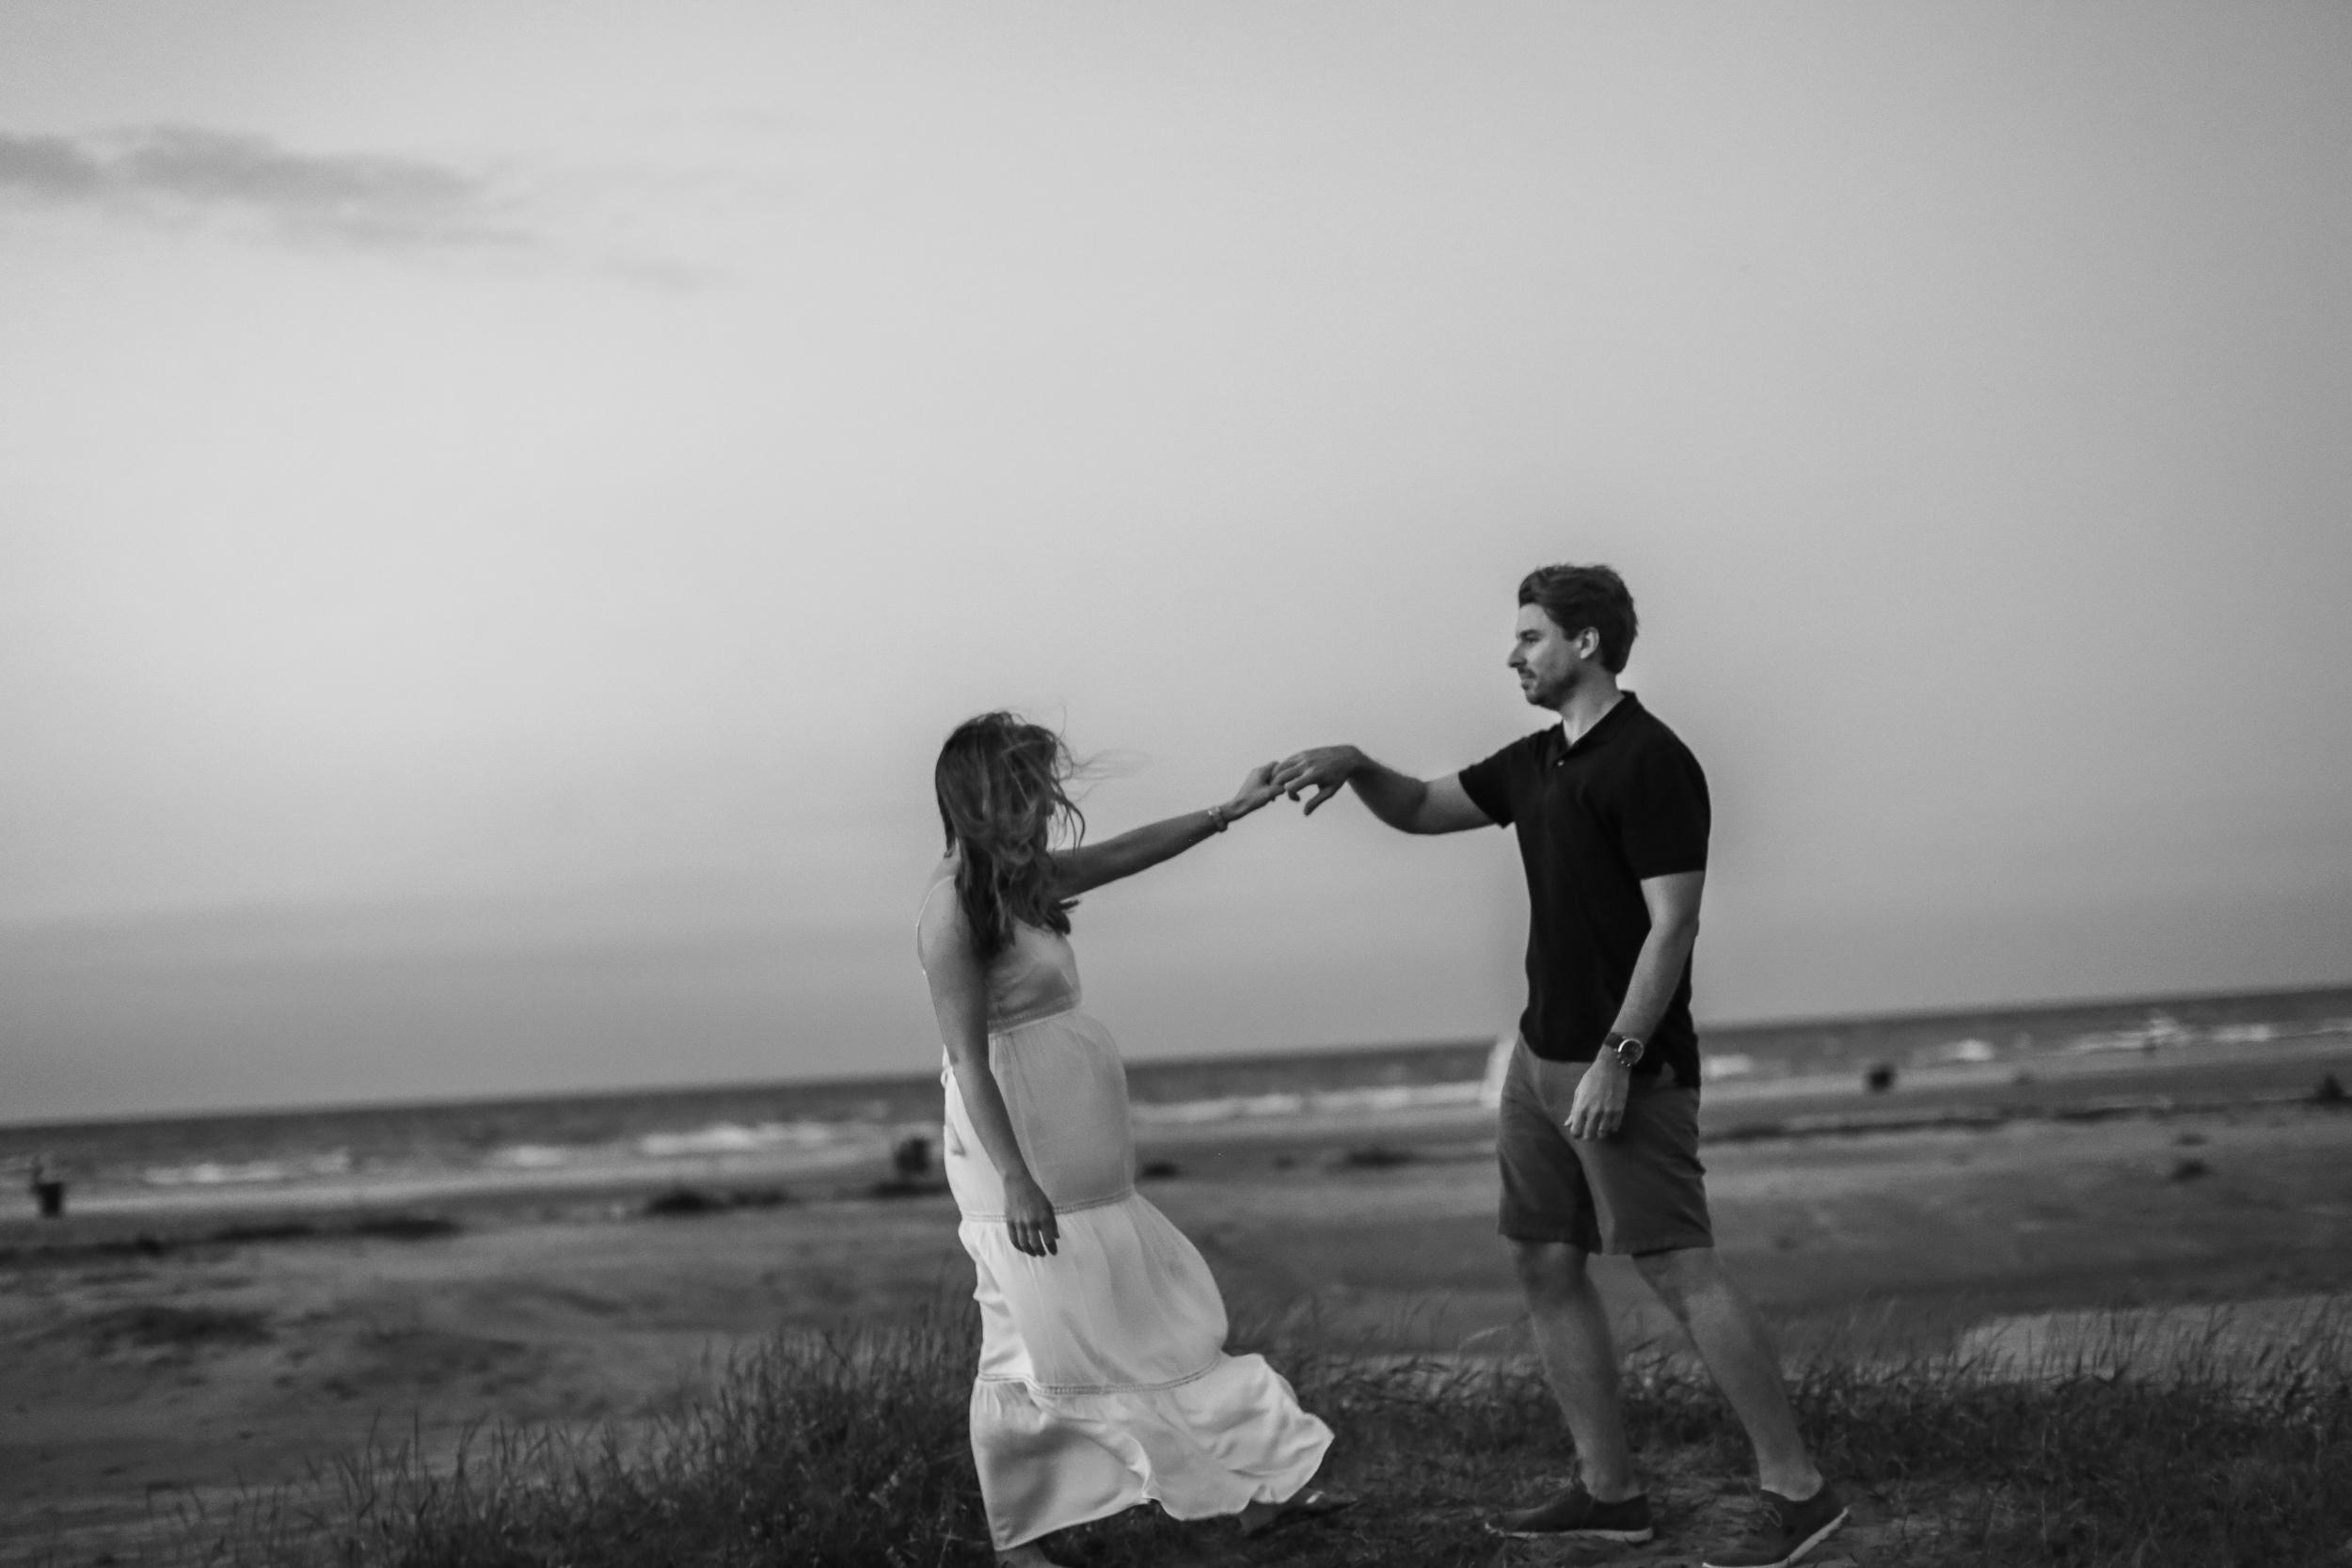 windy city couple beach dance